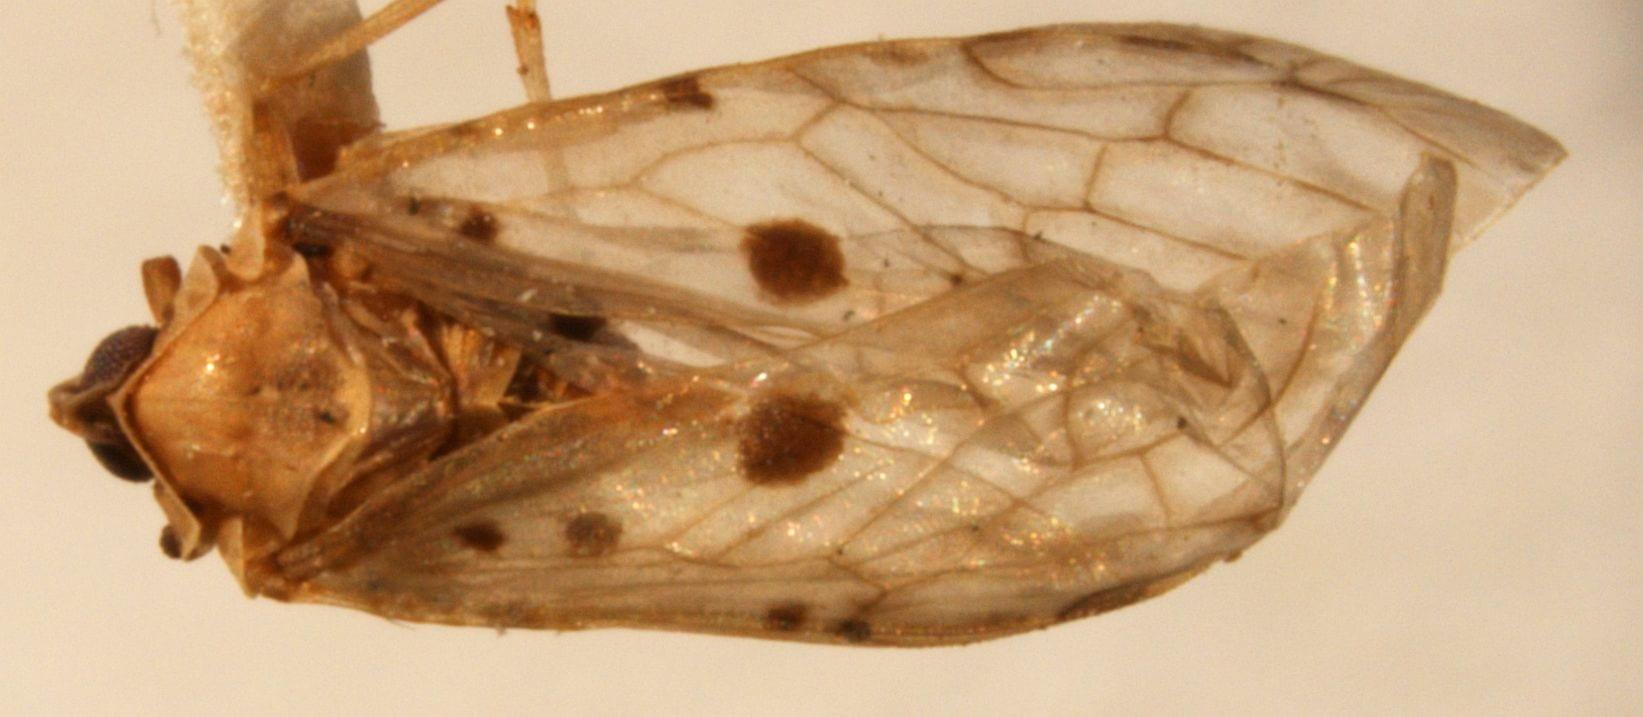 Dysimia maculata